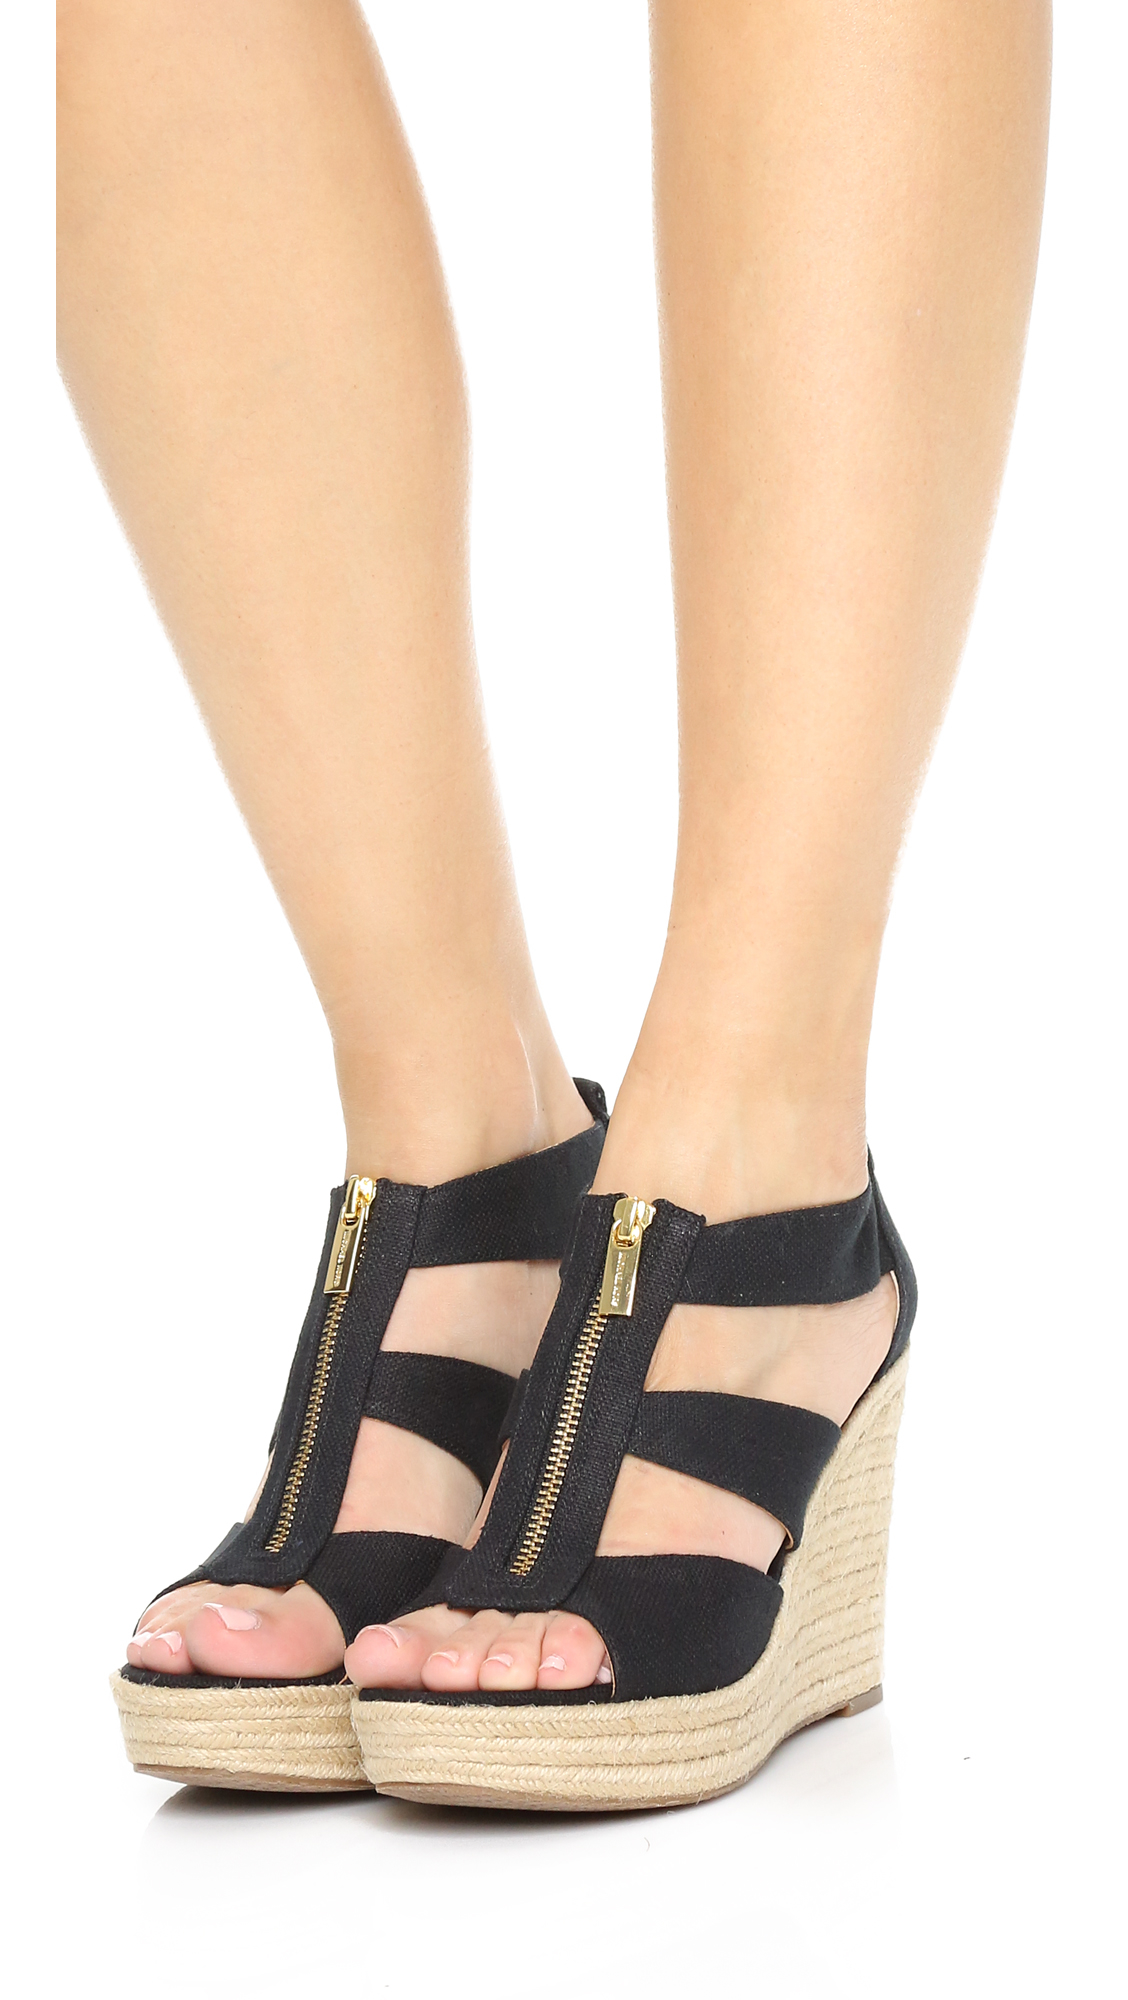 2690e1faa456 MICHAEL Michael Kors Damita Wedge Sandals in Black - Lyst